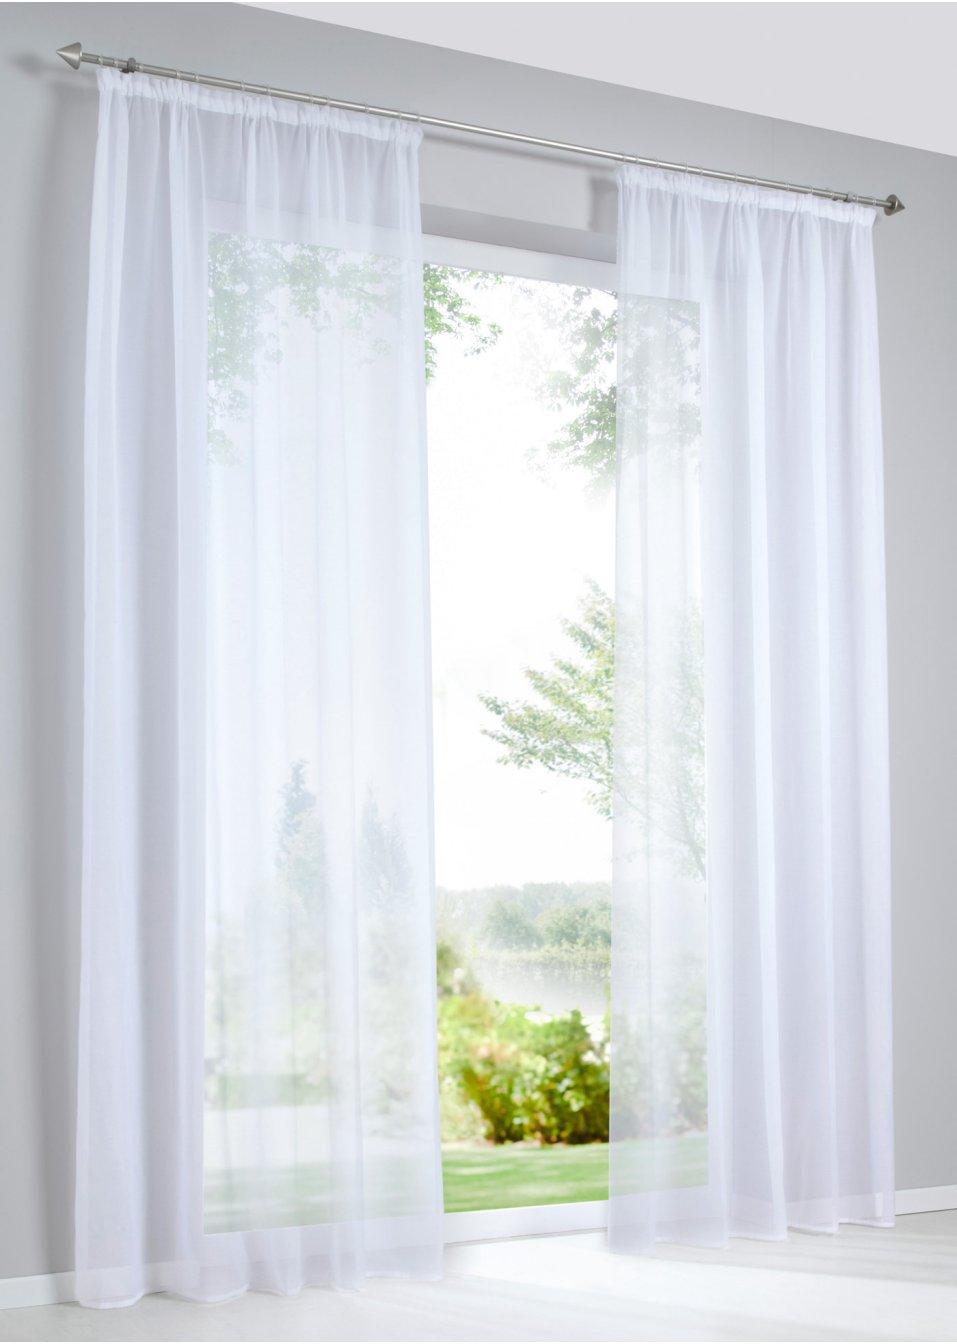 gardine batist 1er pack weiss bpc living online bestellen. Black Bedroom Furniture Sets. Home Design Ideas